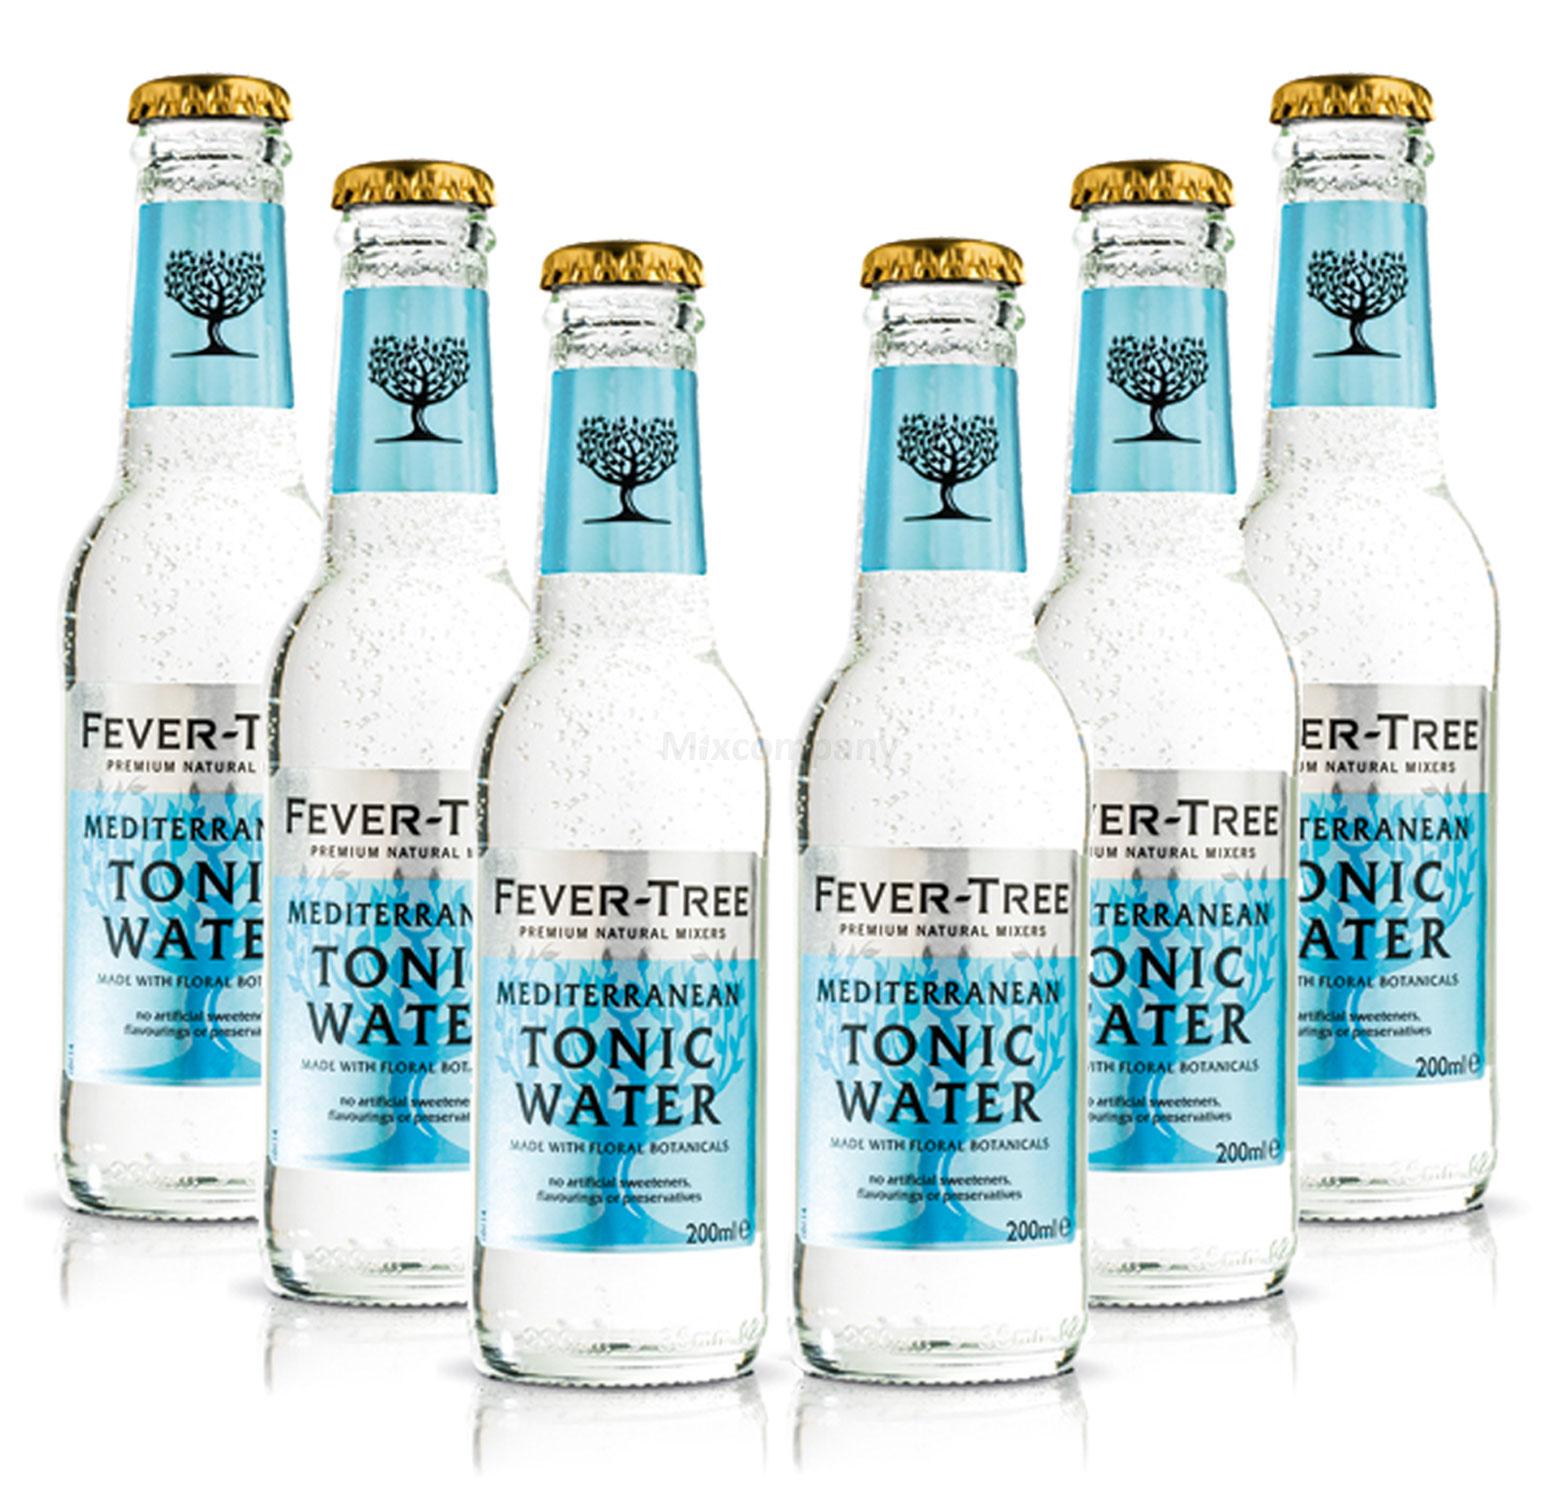 Fever-Tree Mediterranean Tonic Water Set - 6x 200ml inkl. Pfand MEHRWEG